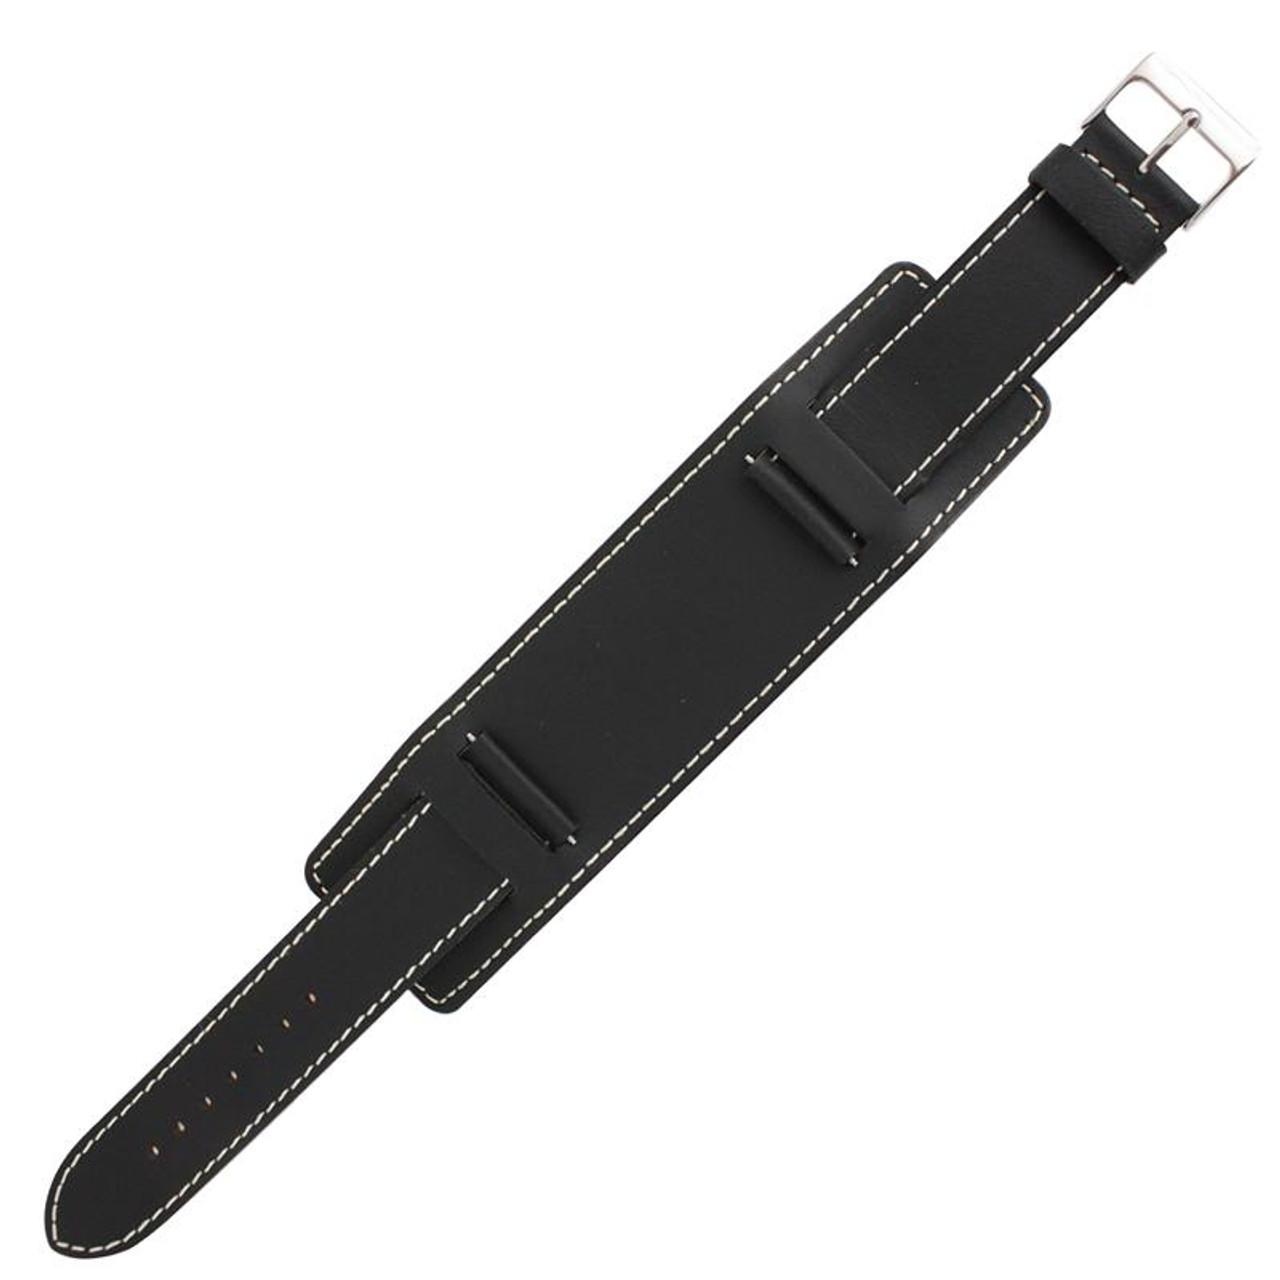 f39ff519a49 18mm Wide Watch band Black Leather Watch Cuff Strap 7 1 2 Inch Length